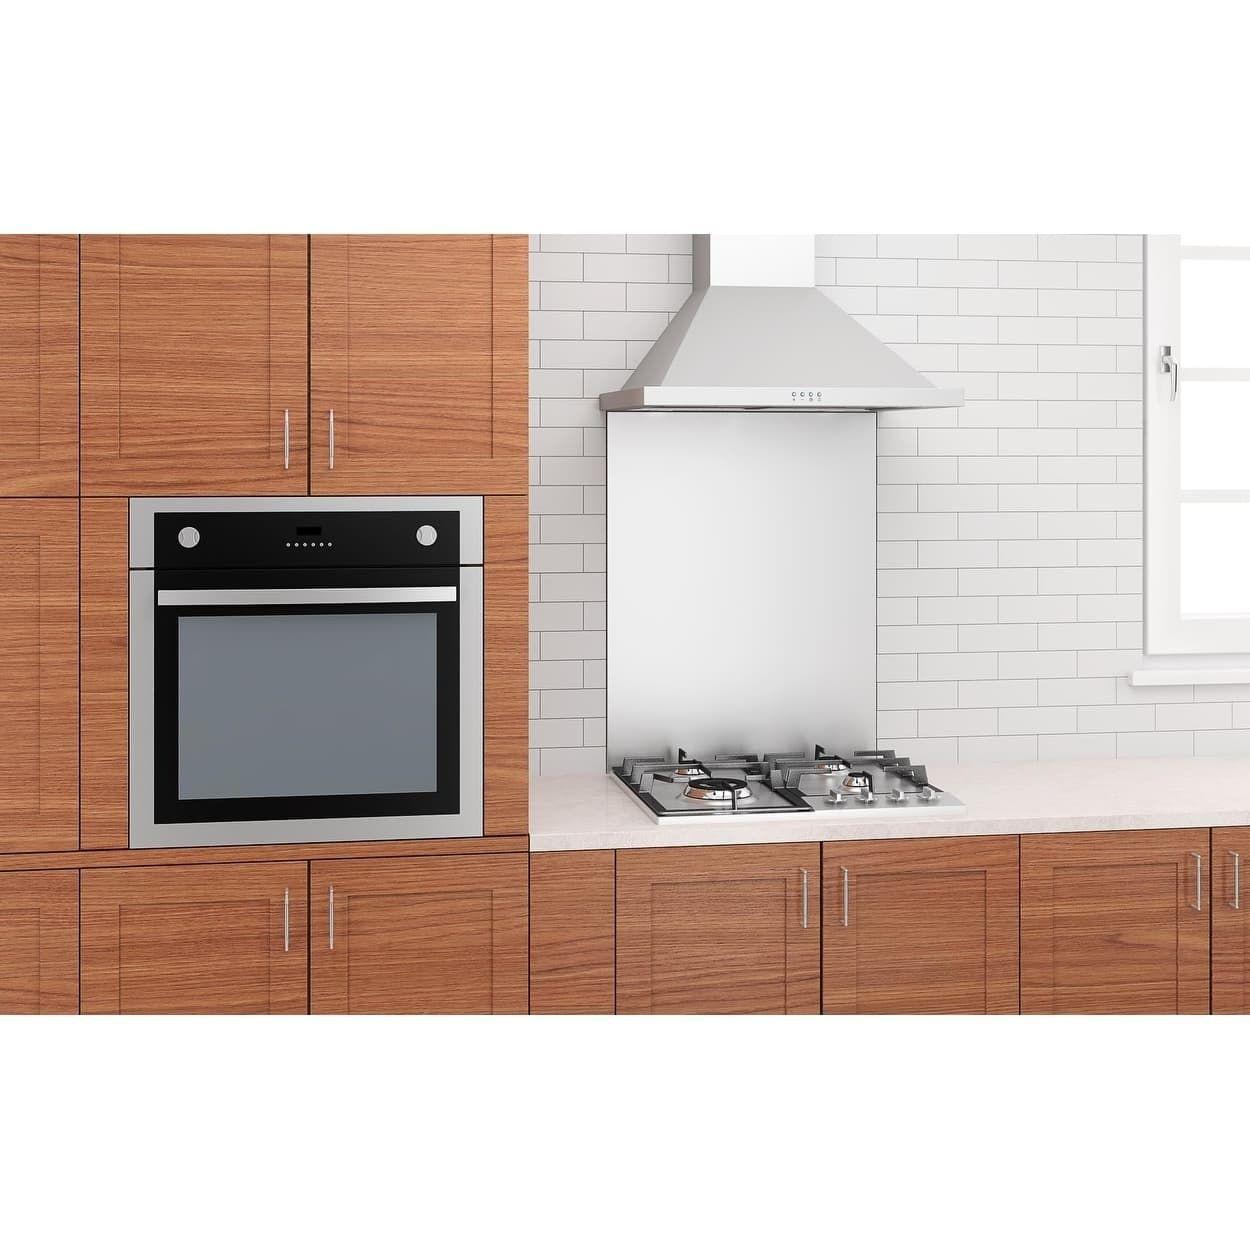 Ancona 24 Casetta 600 Cfm Convertible Wall Mount Range Hood Silver Wall Mount Range Hood Kitchen Large Appliances Large Appliances